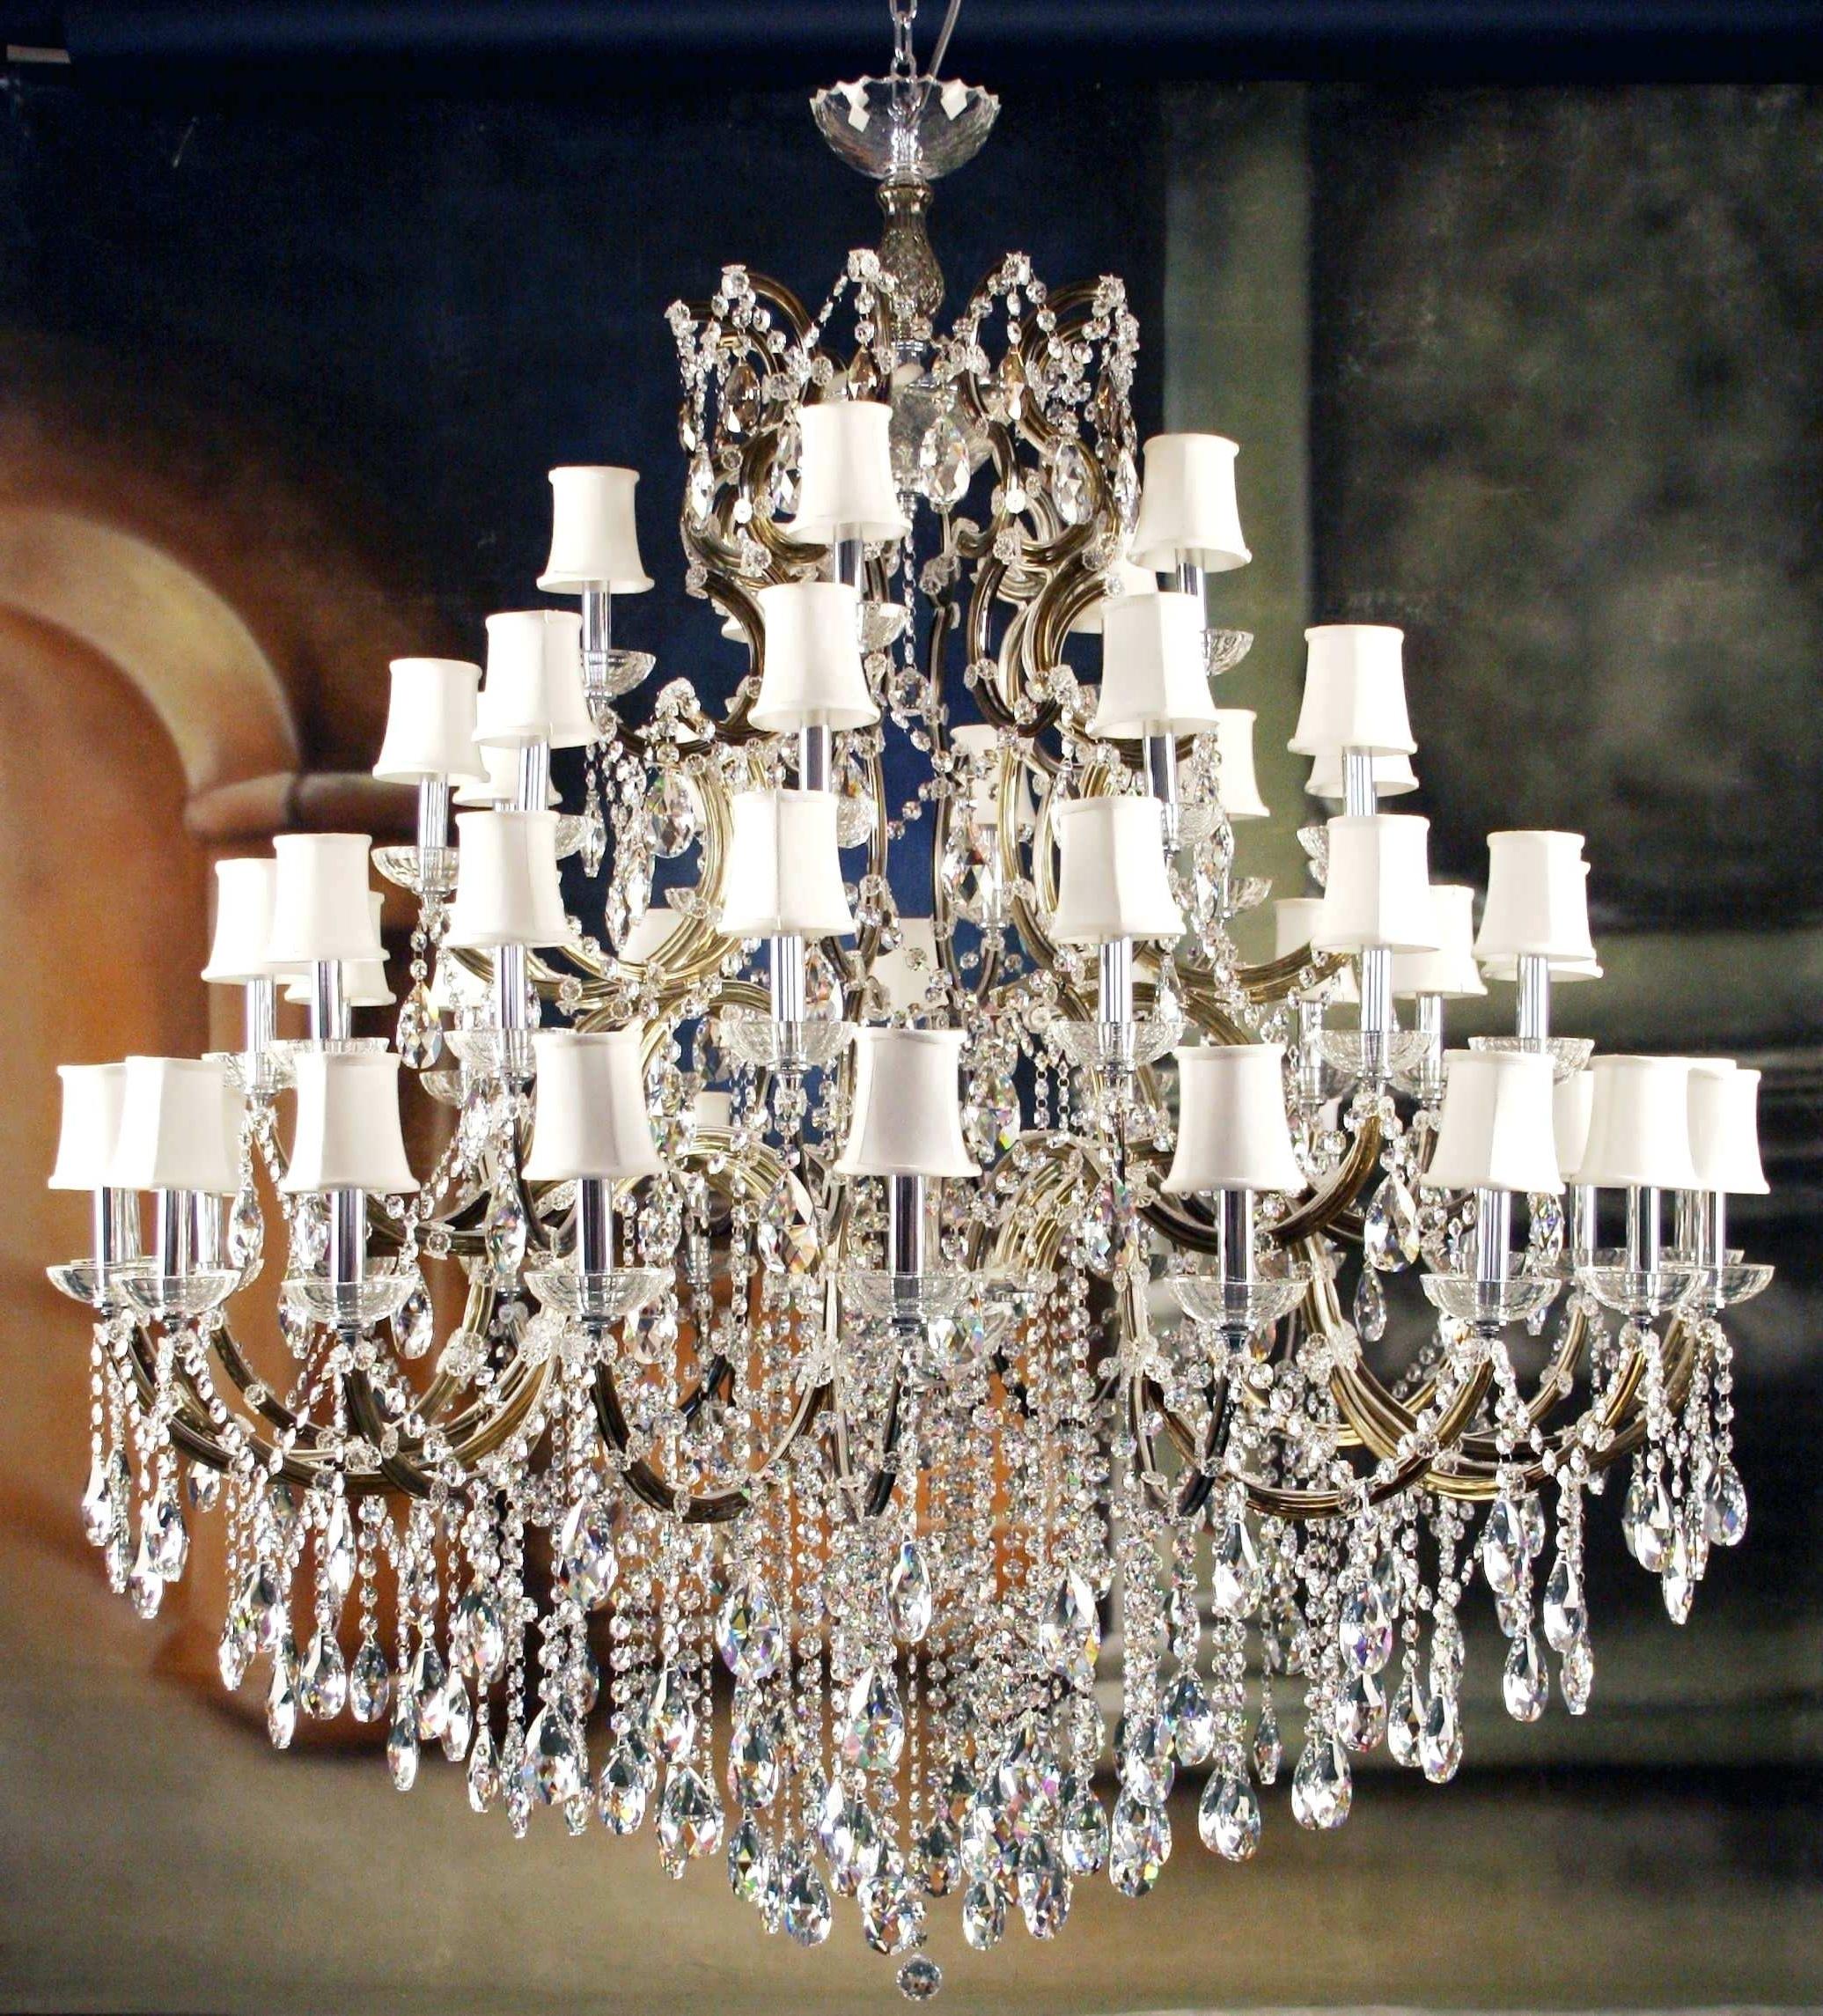 Costco Lighting Chandeliers With Latest Chandeliers : Costco Chandelier Luxury Creactividadfo Page (View 14 of 15)